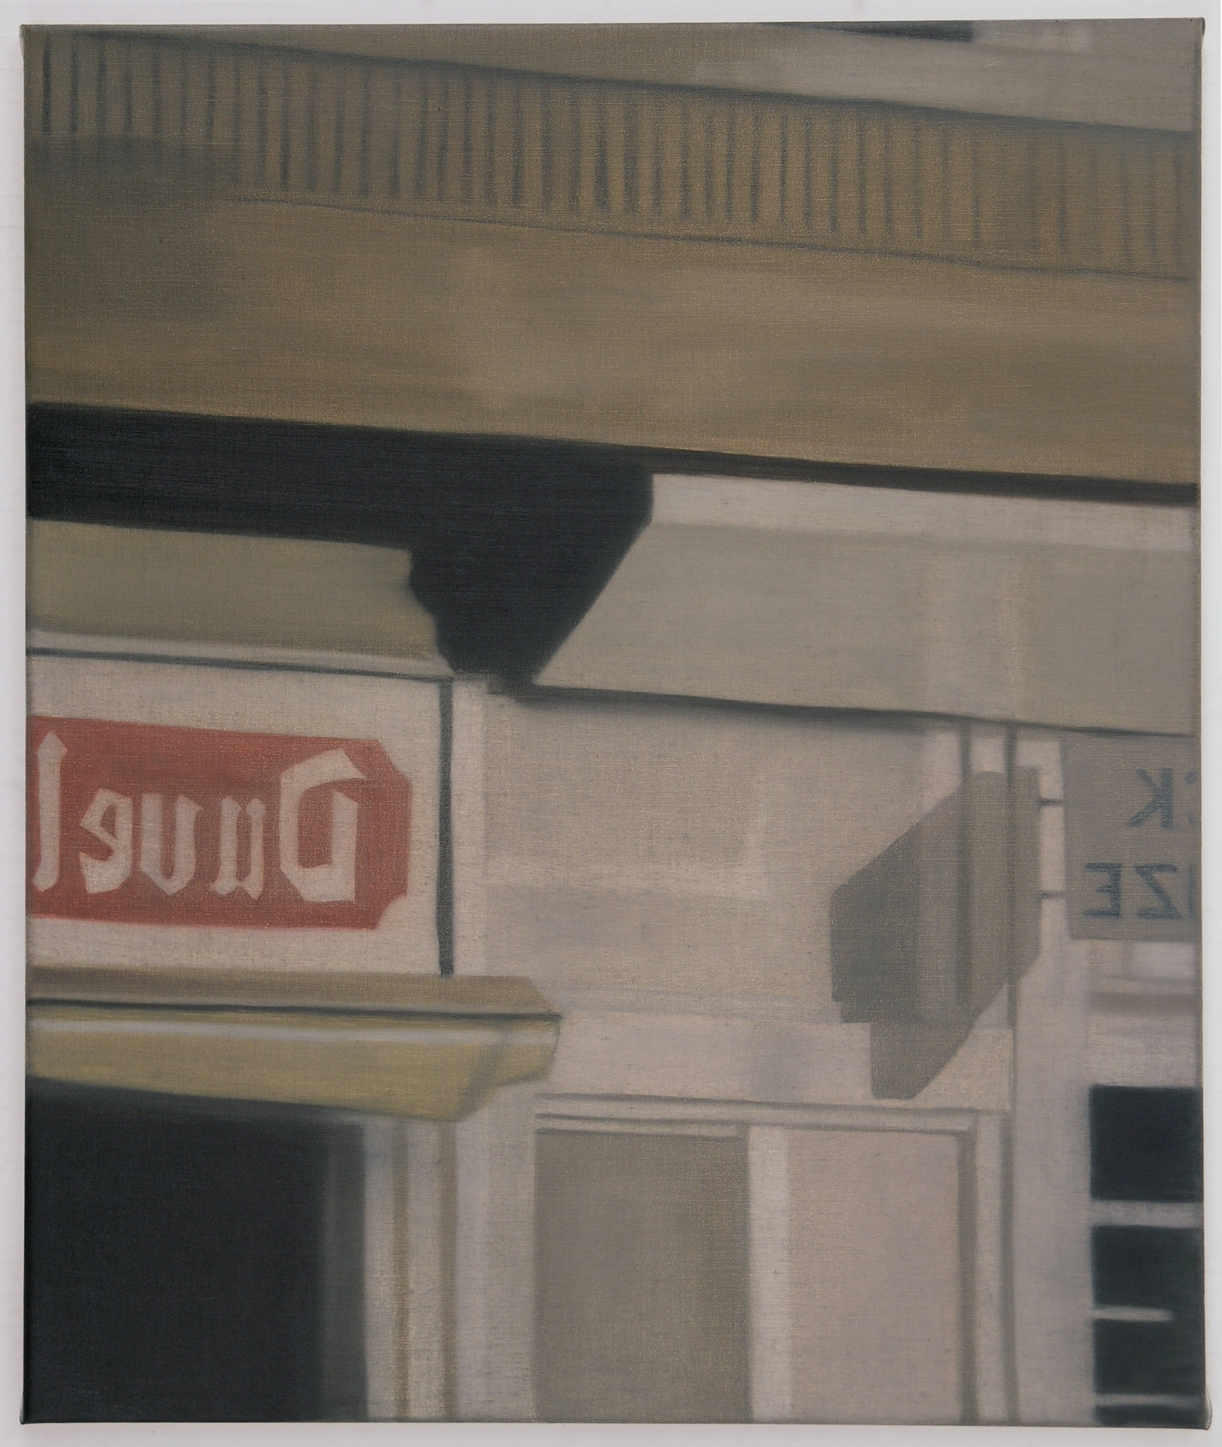 Bert de Beul, Untitled, 2005, Oil on canvas, 74 x 62 cm